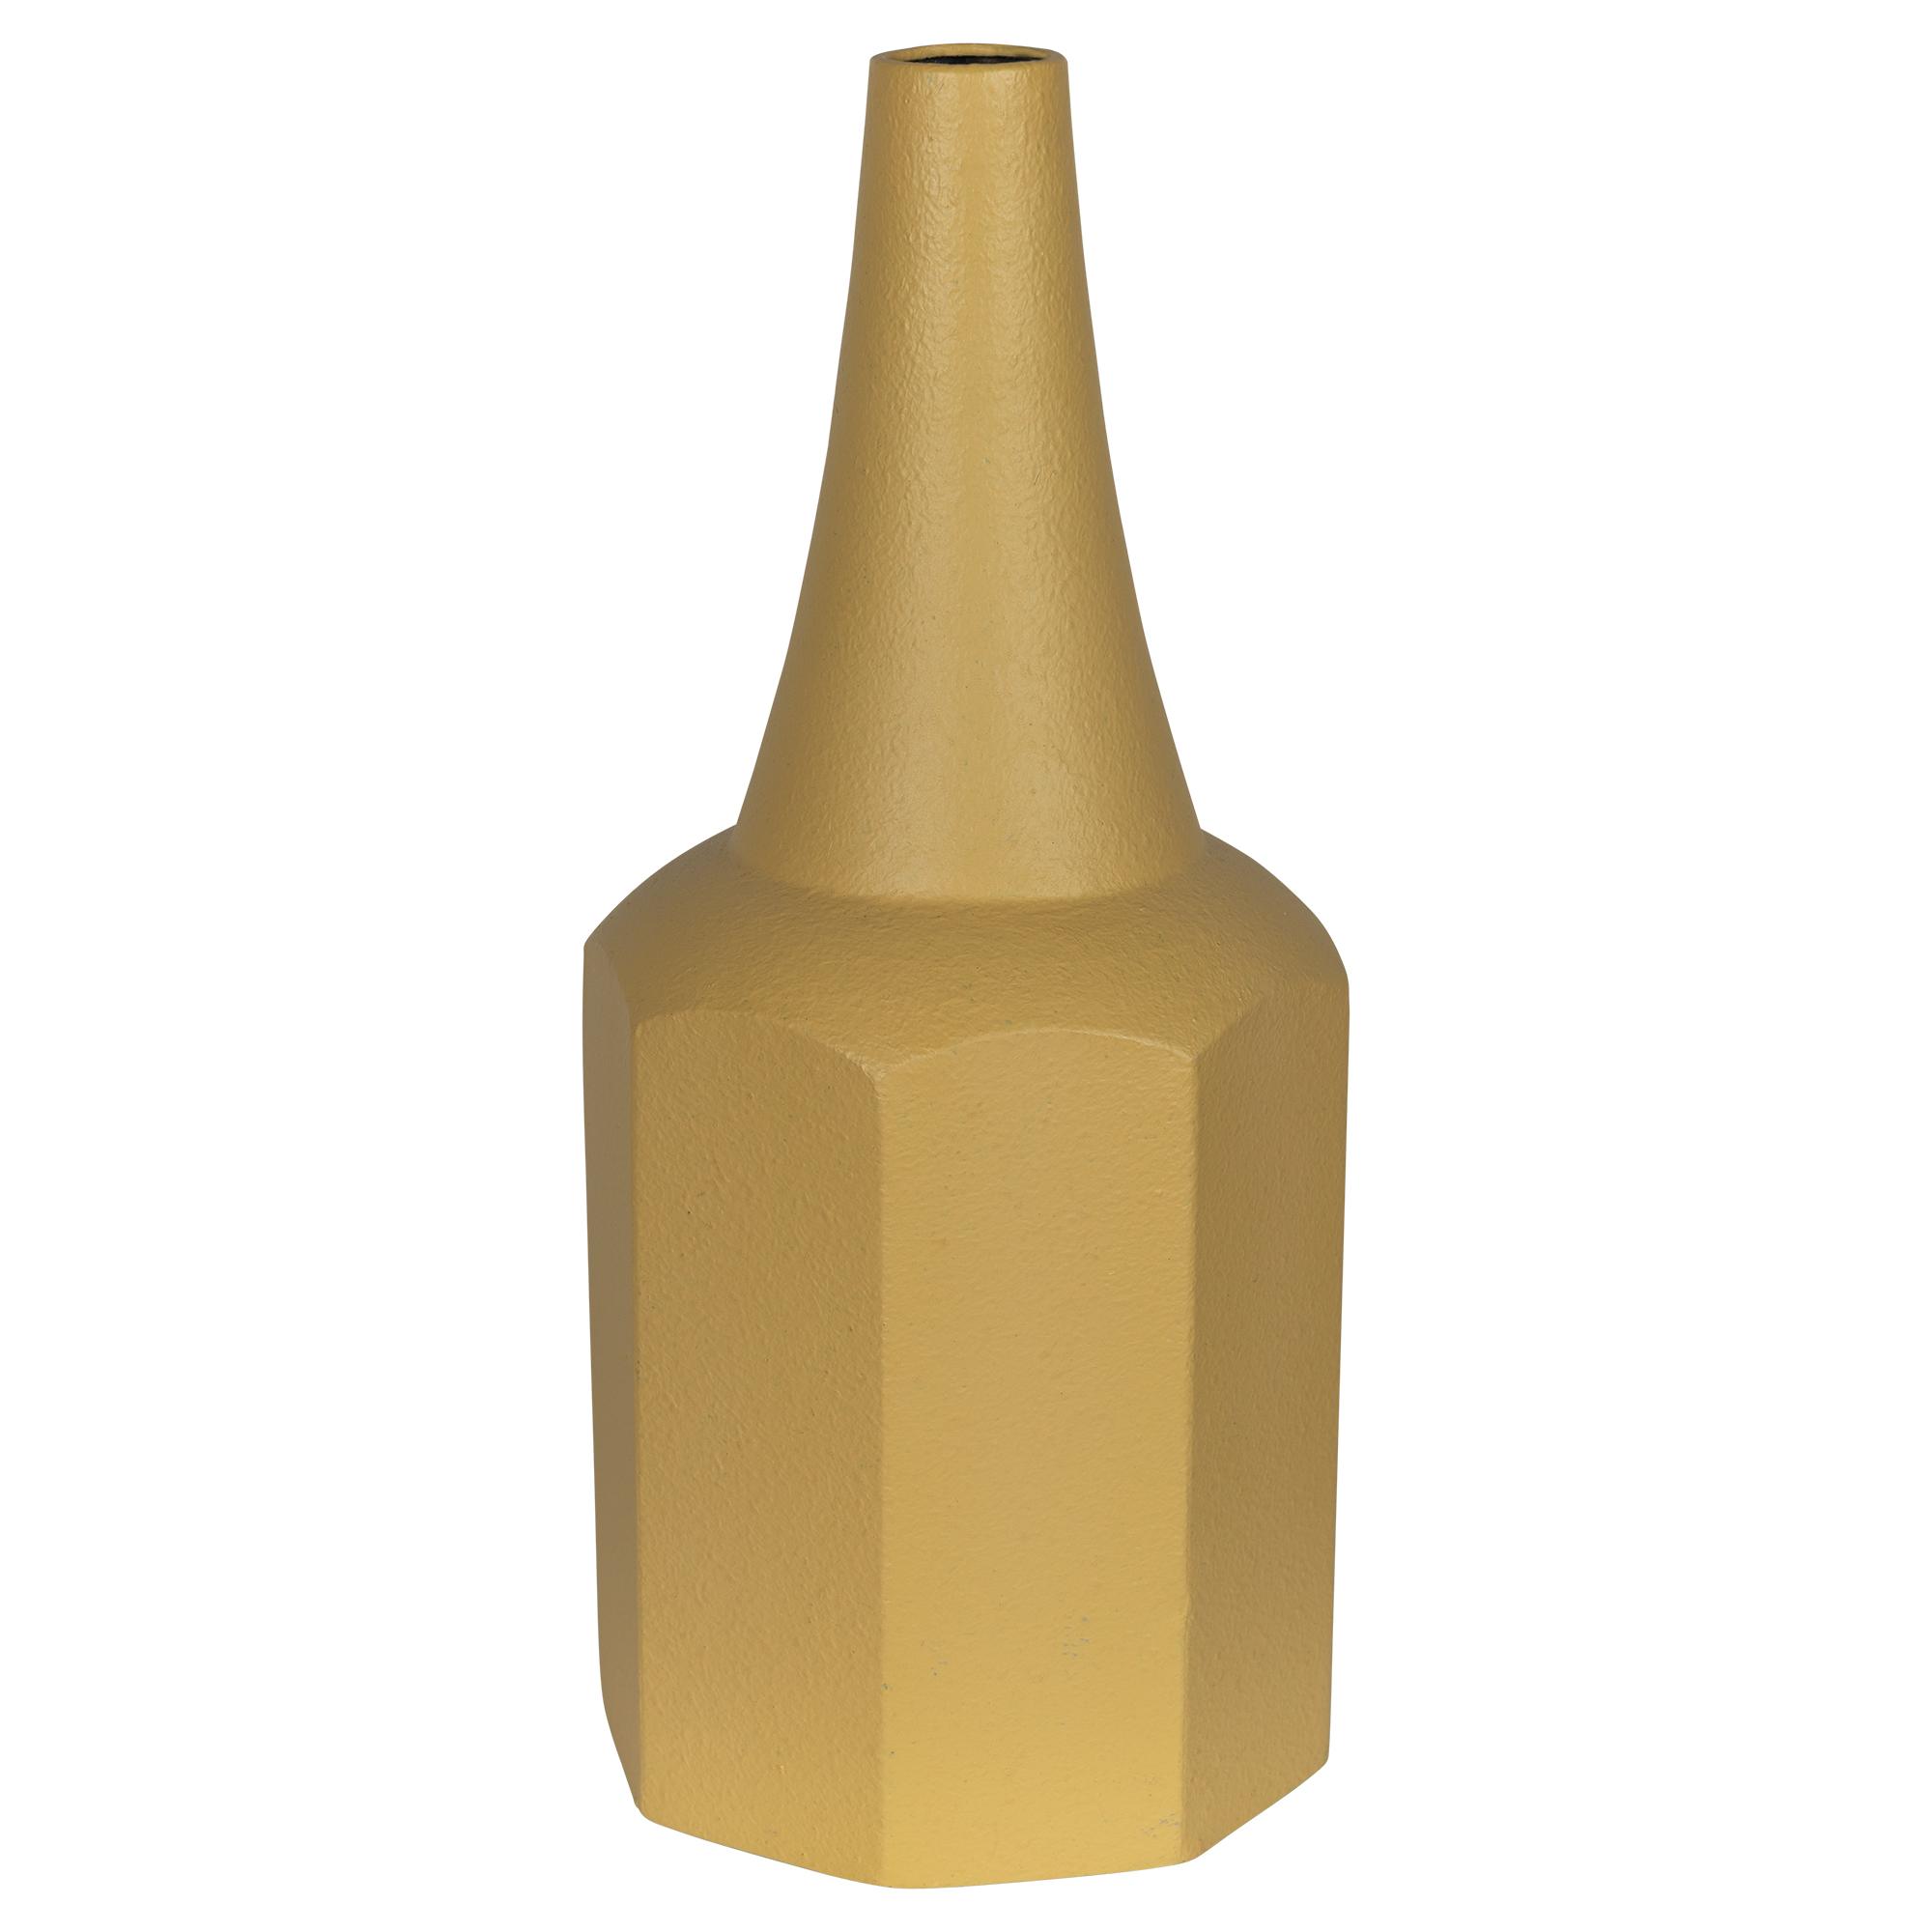 Stratton Home Decor Yellow Single Stem Vase